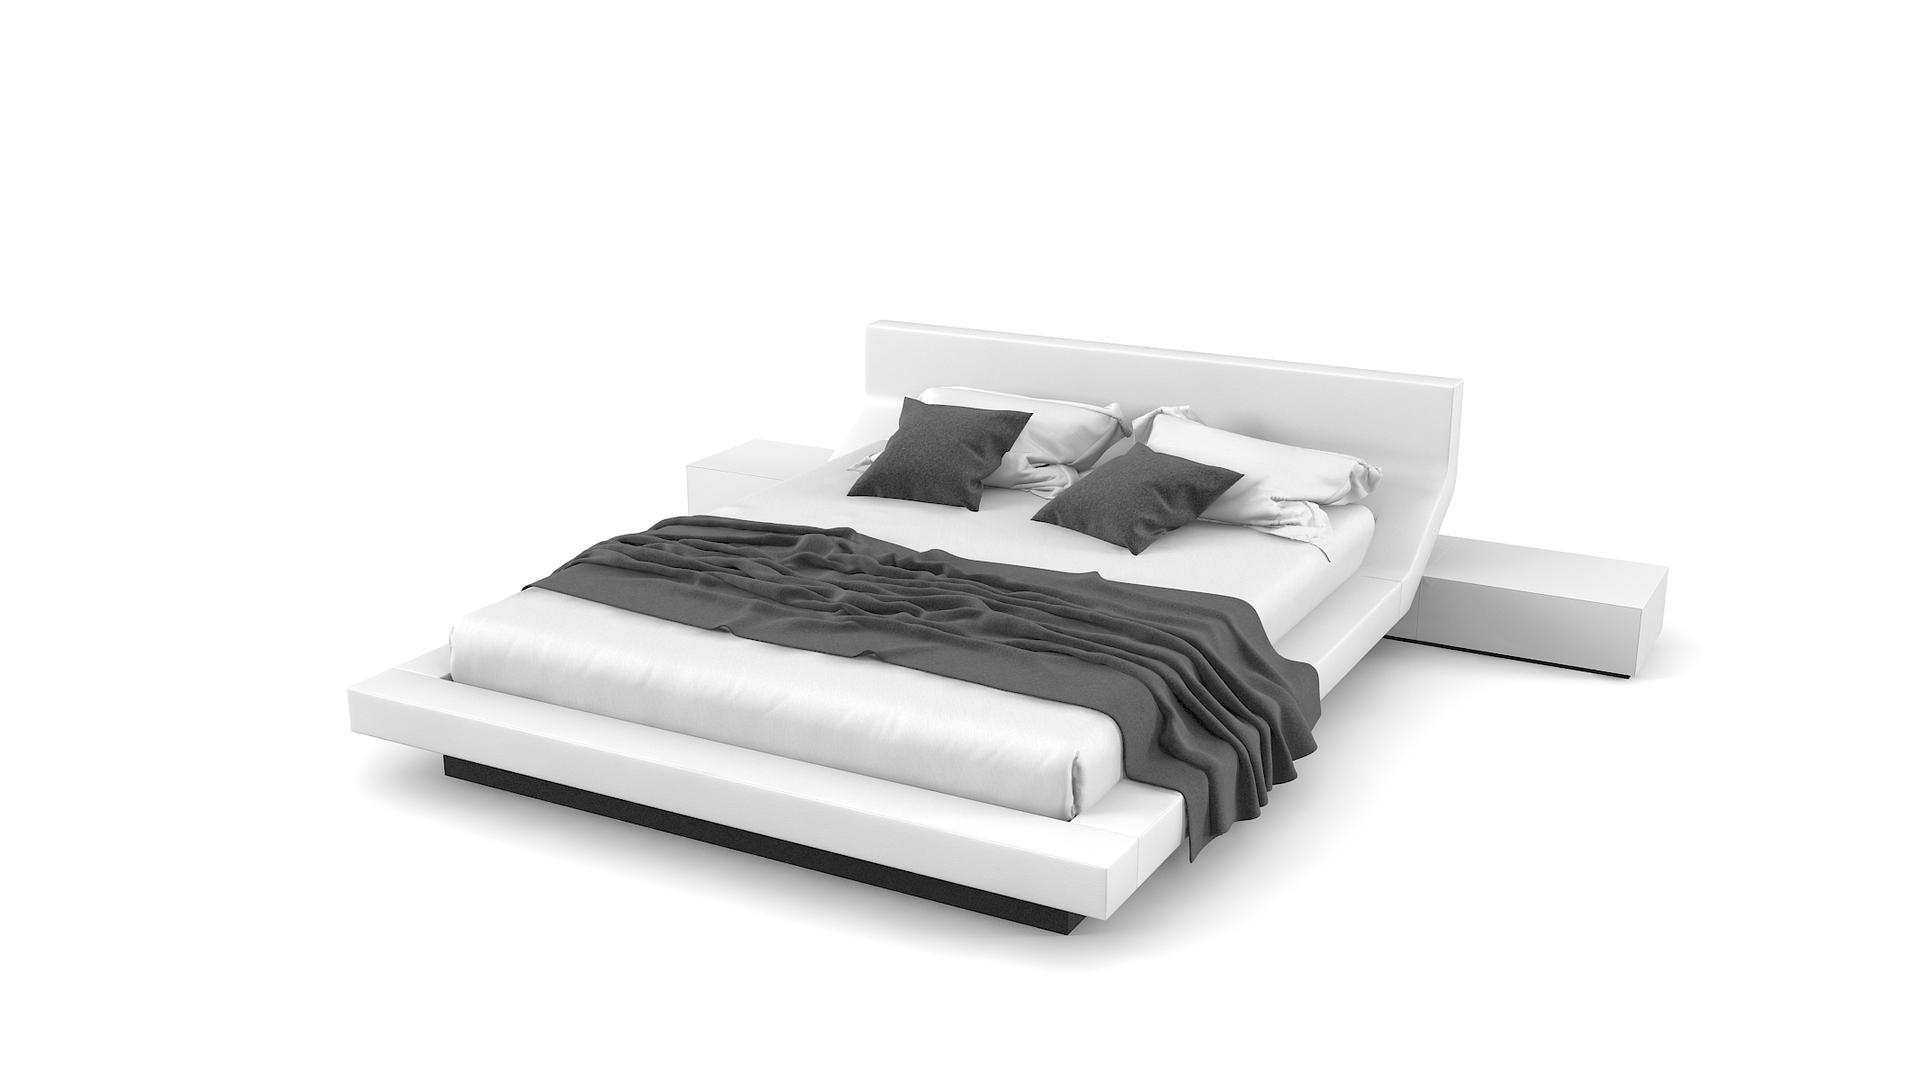 Lipla bed 2.jpg